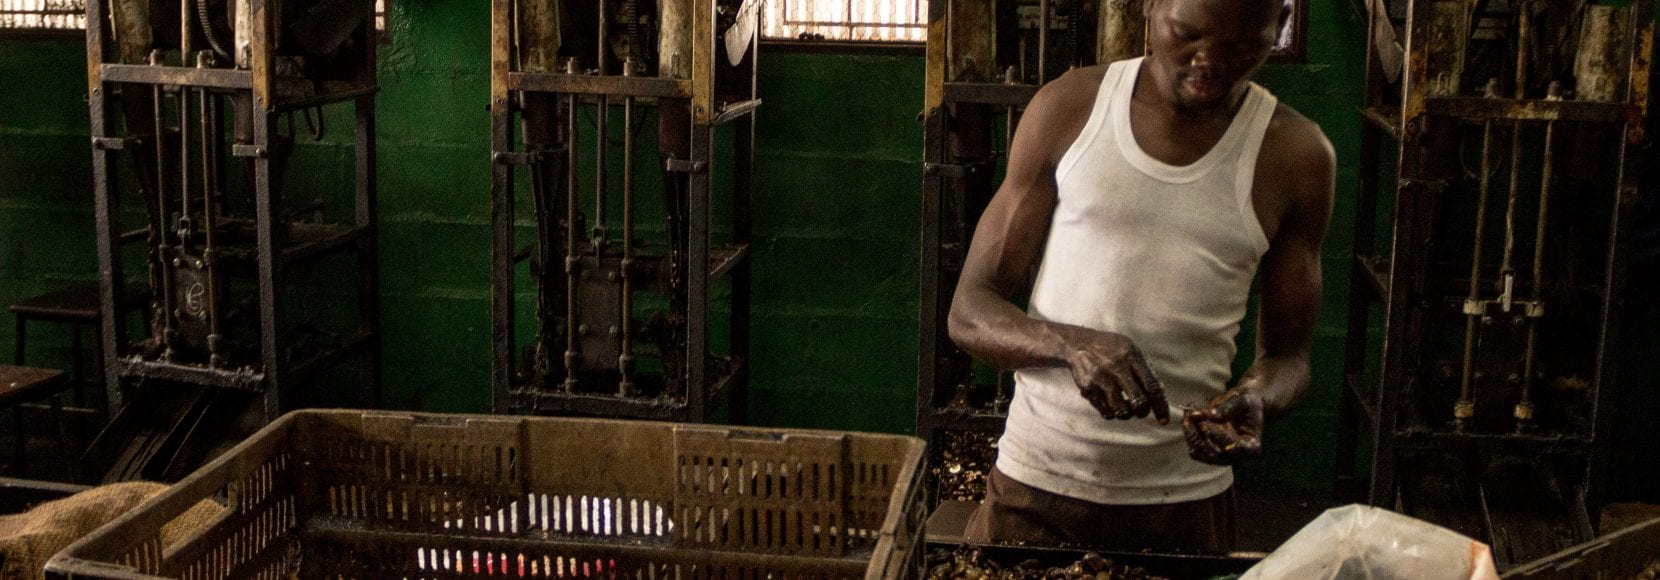 Worker hand processing cashews at Mozacaju facility